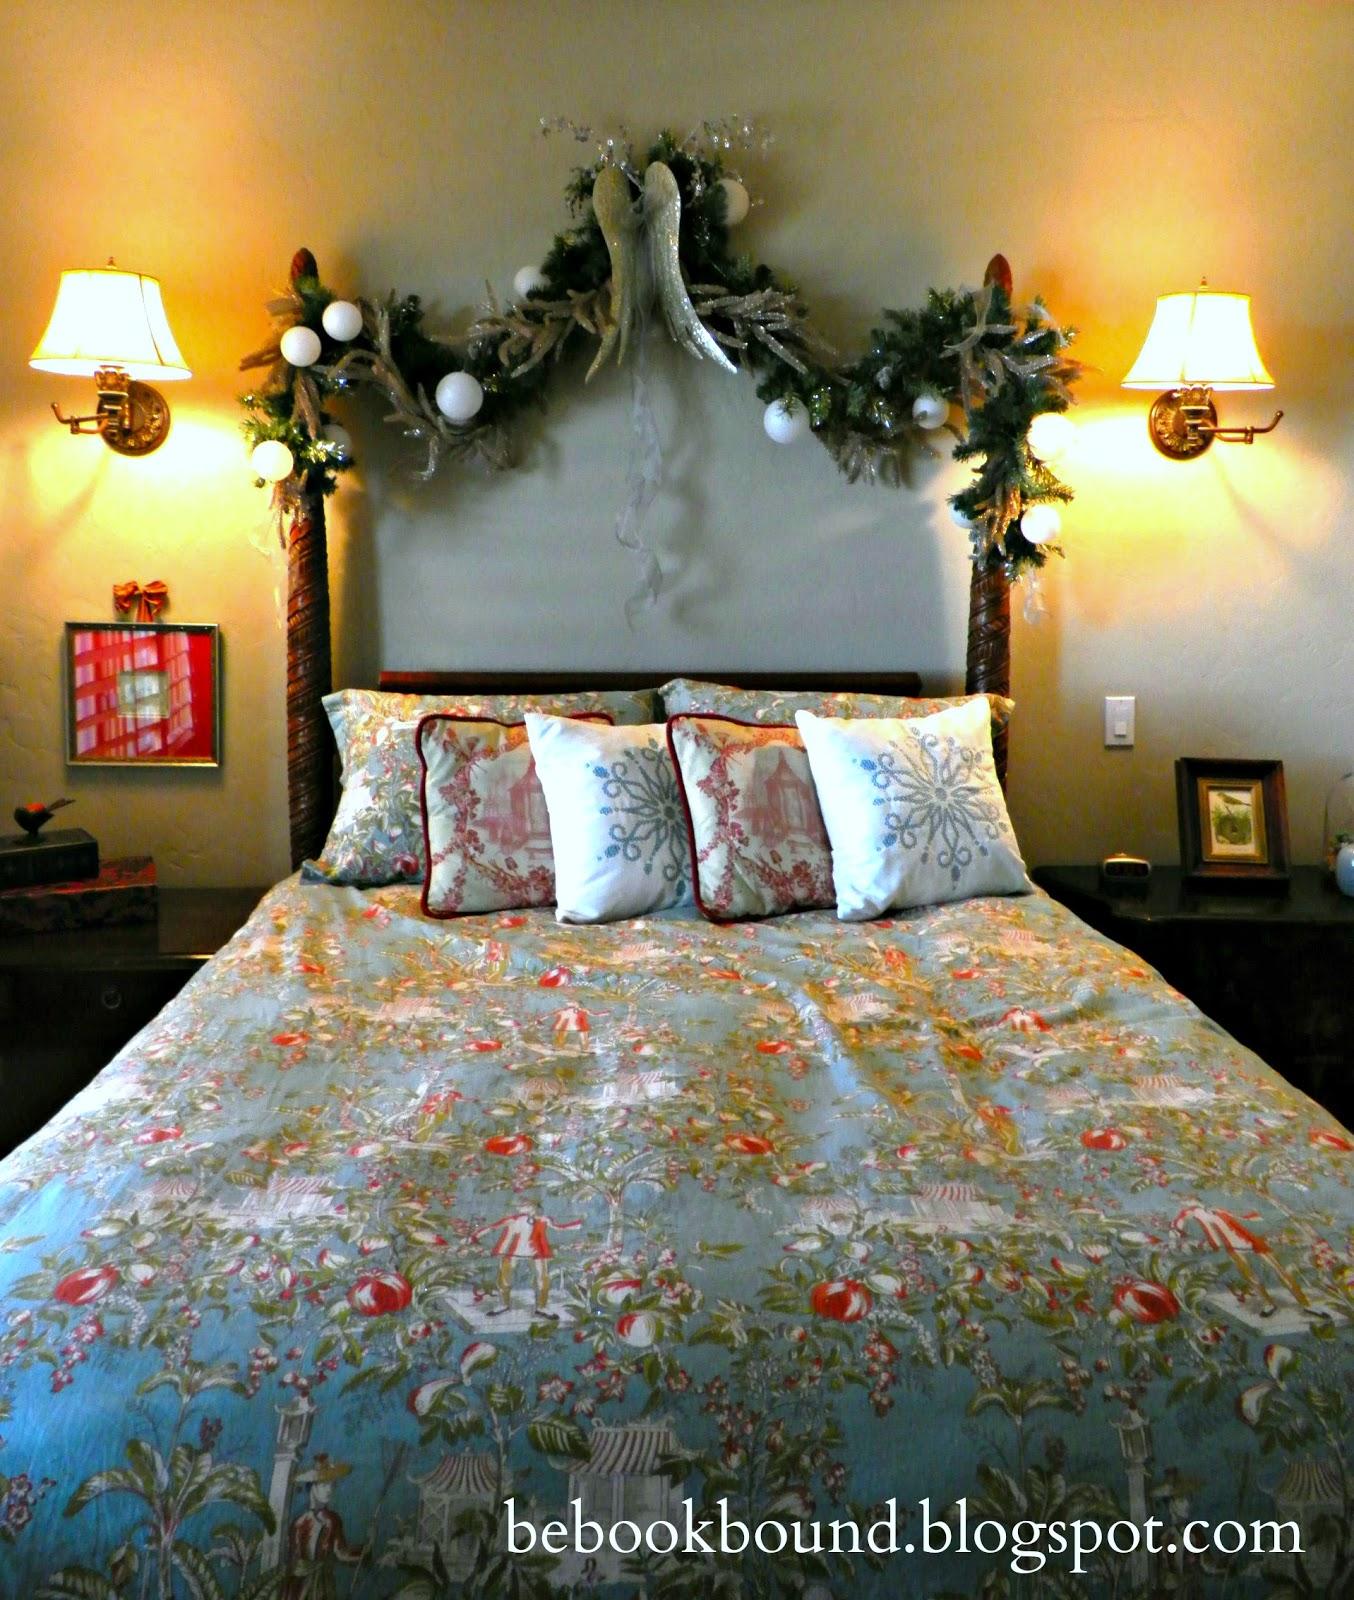 http://1.bp.blogspot.com/-G6mGyyCFKto/UMrKrXJ7XeI/AAAAAAAADAI/0q7JVxxmrwY/s1600/Guest+Bedroom.jpg